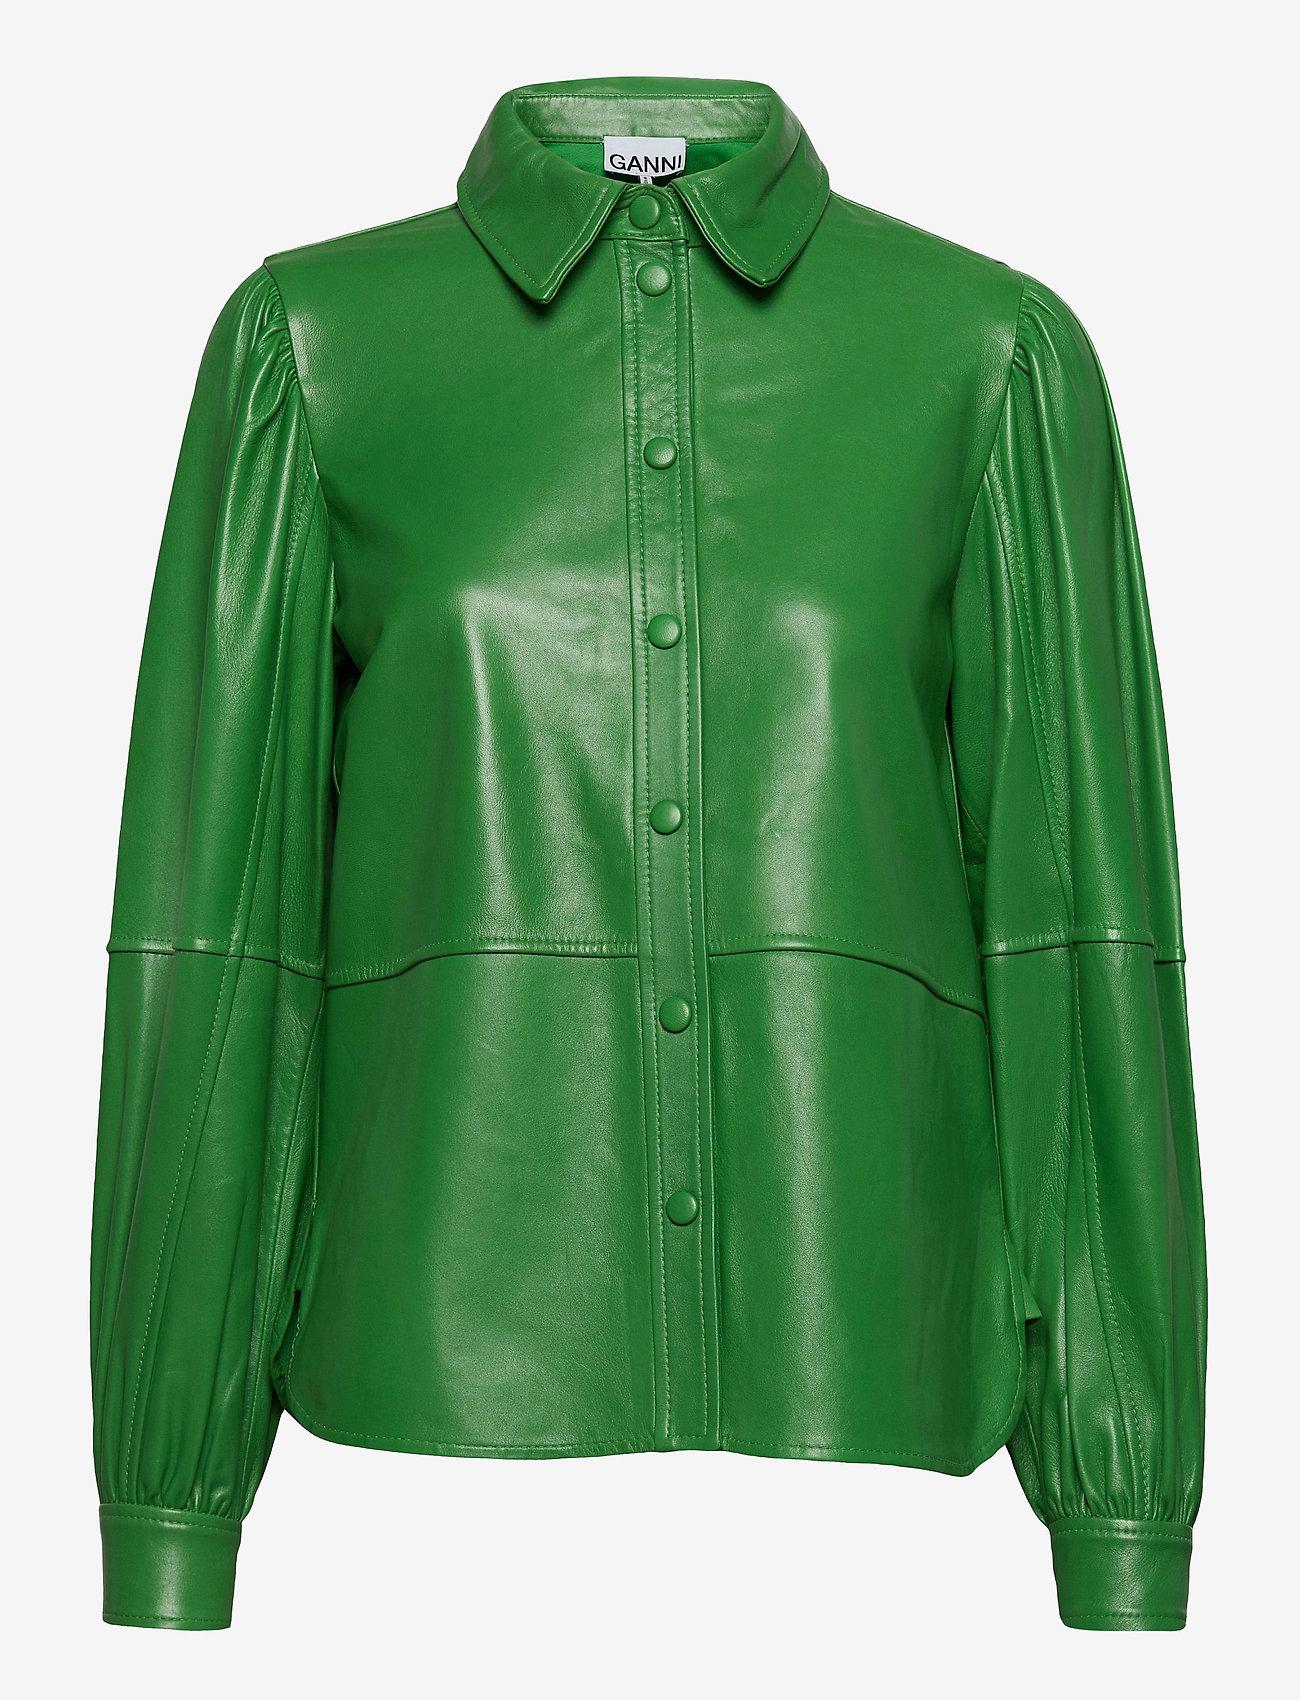 Ganni - Shirt - langermede skjorter - kelly green - 0